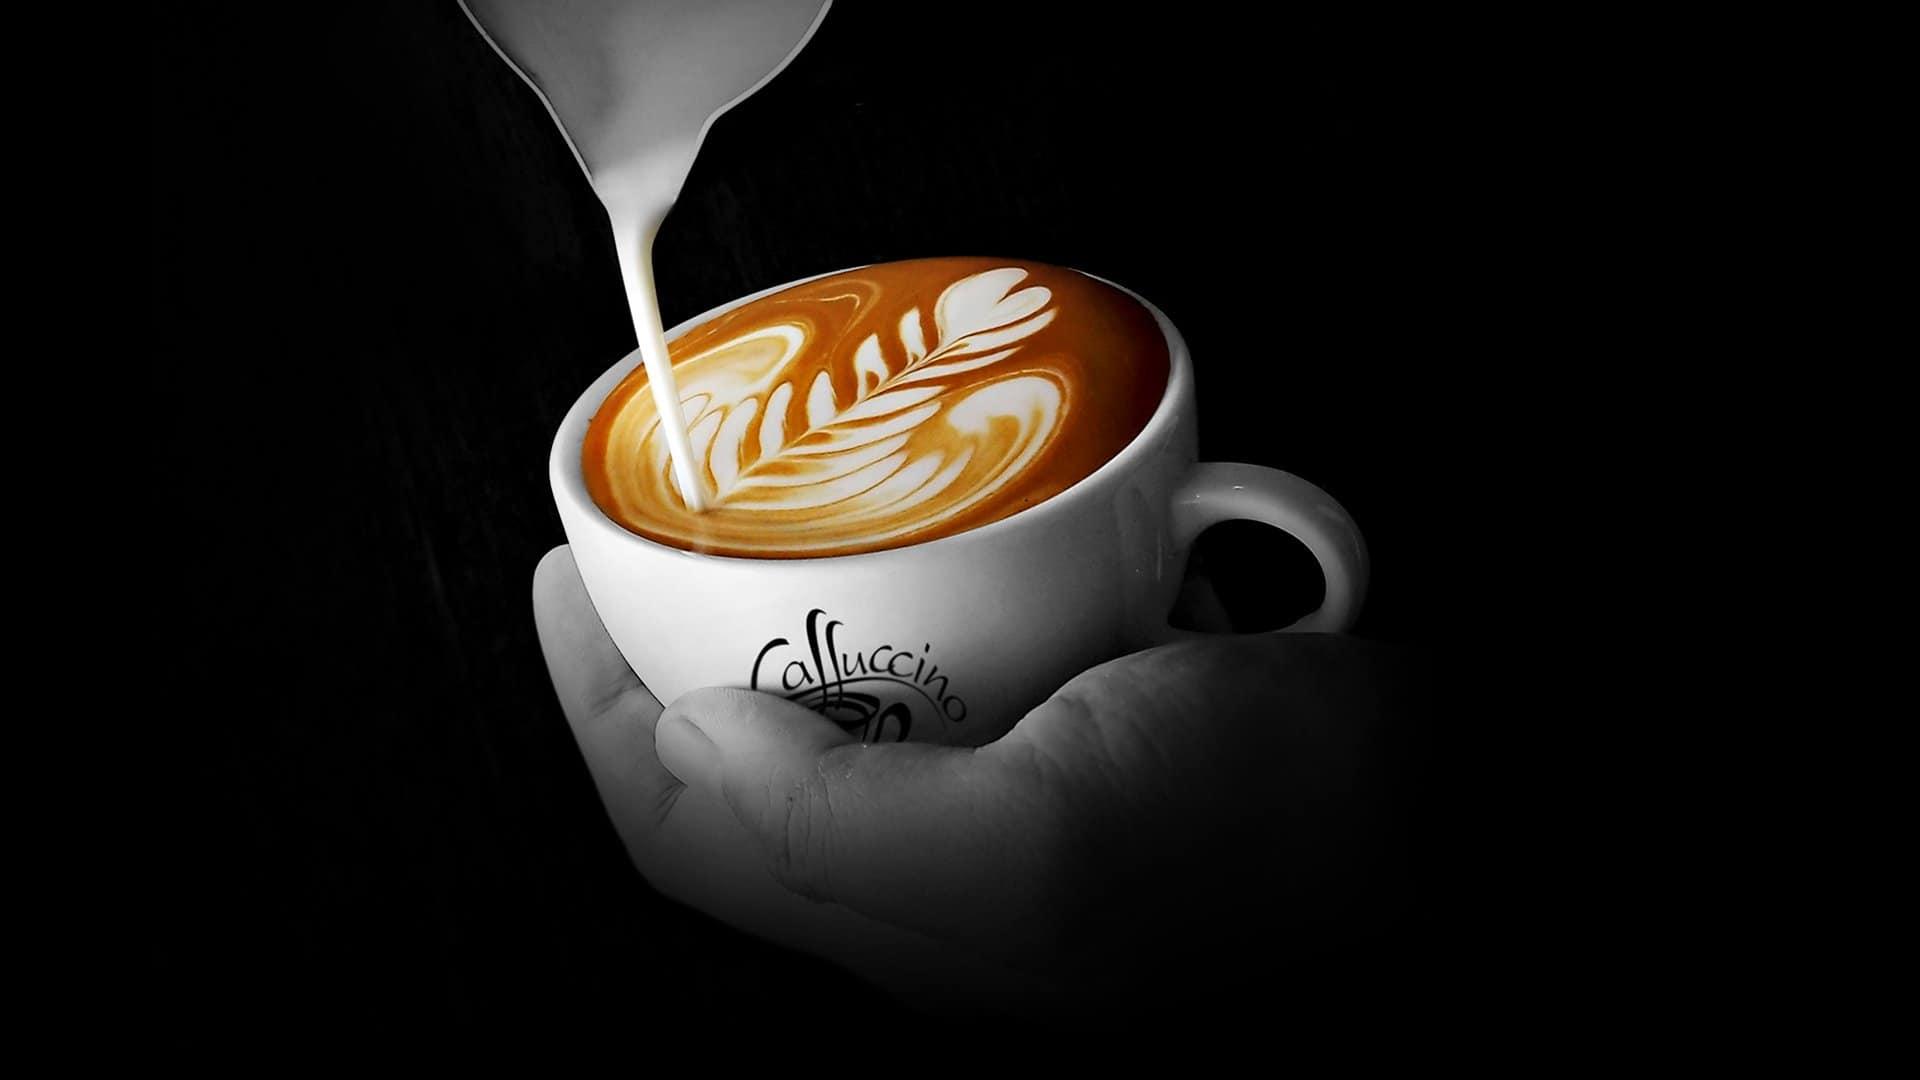 Caffuccino - Magog